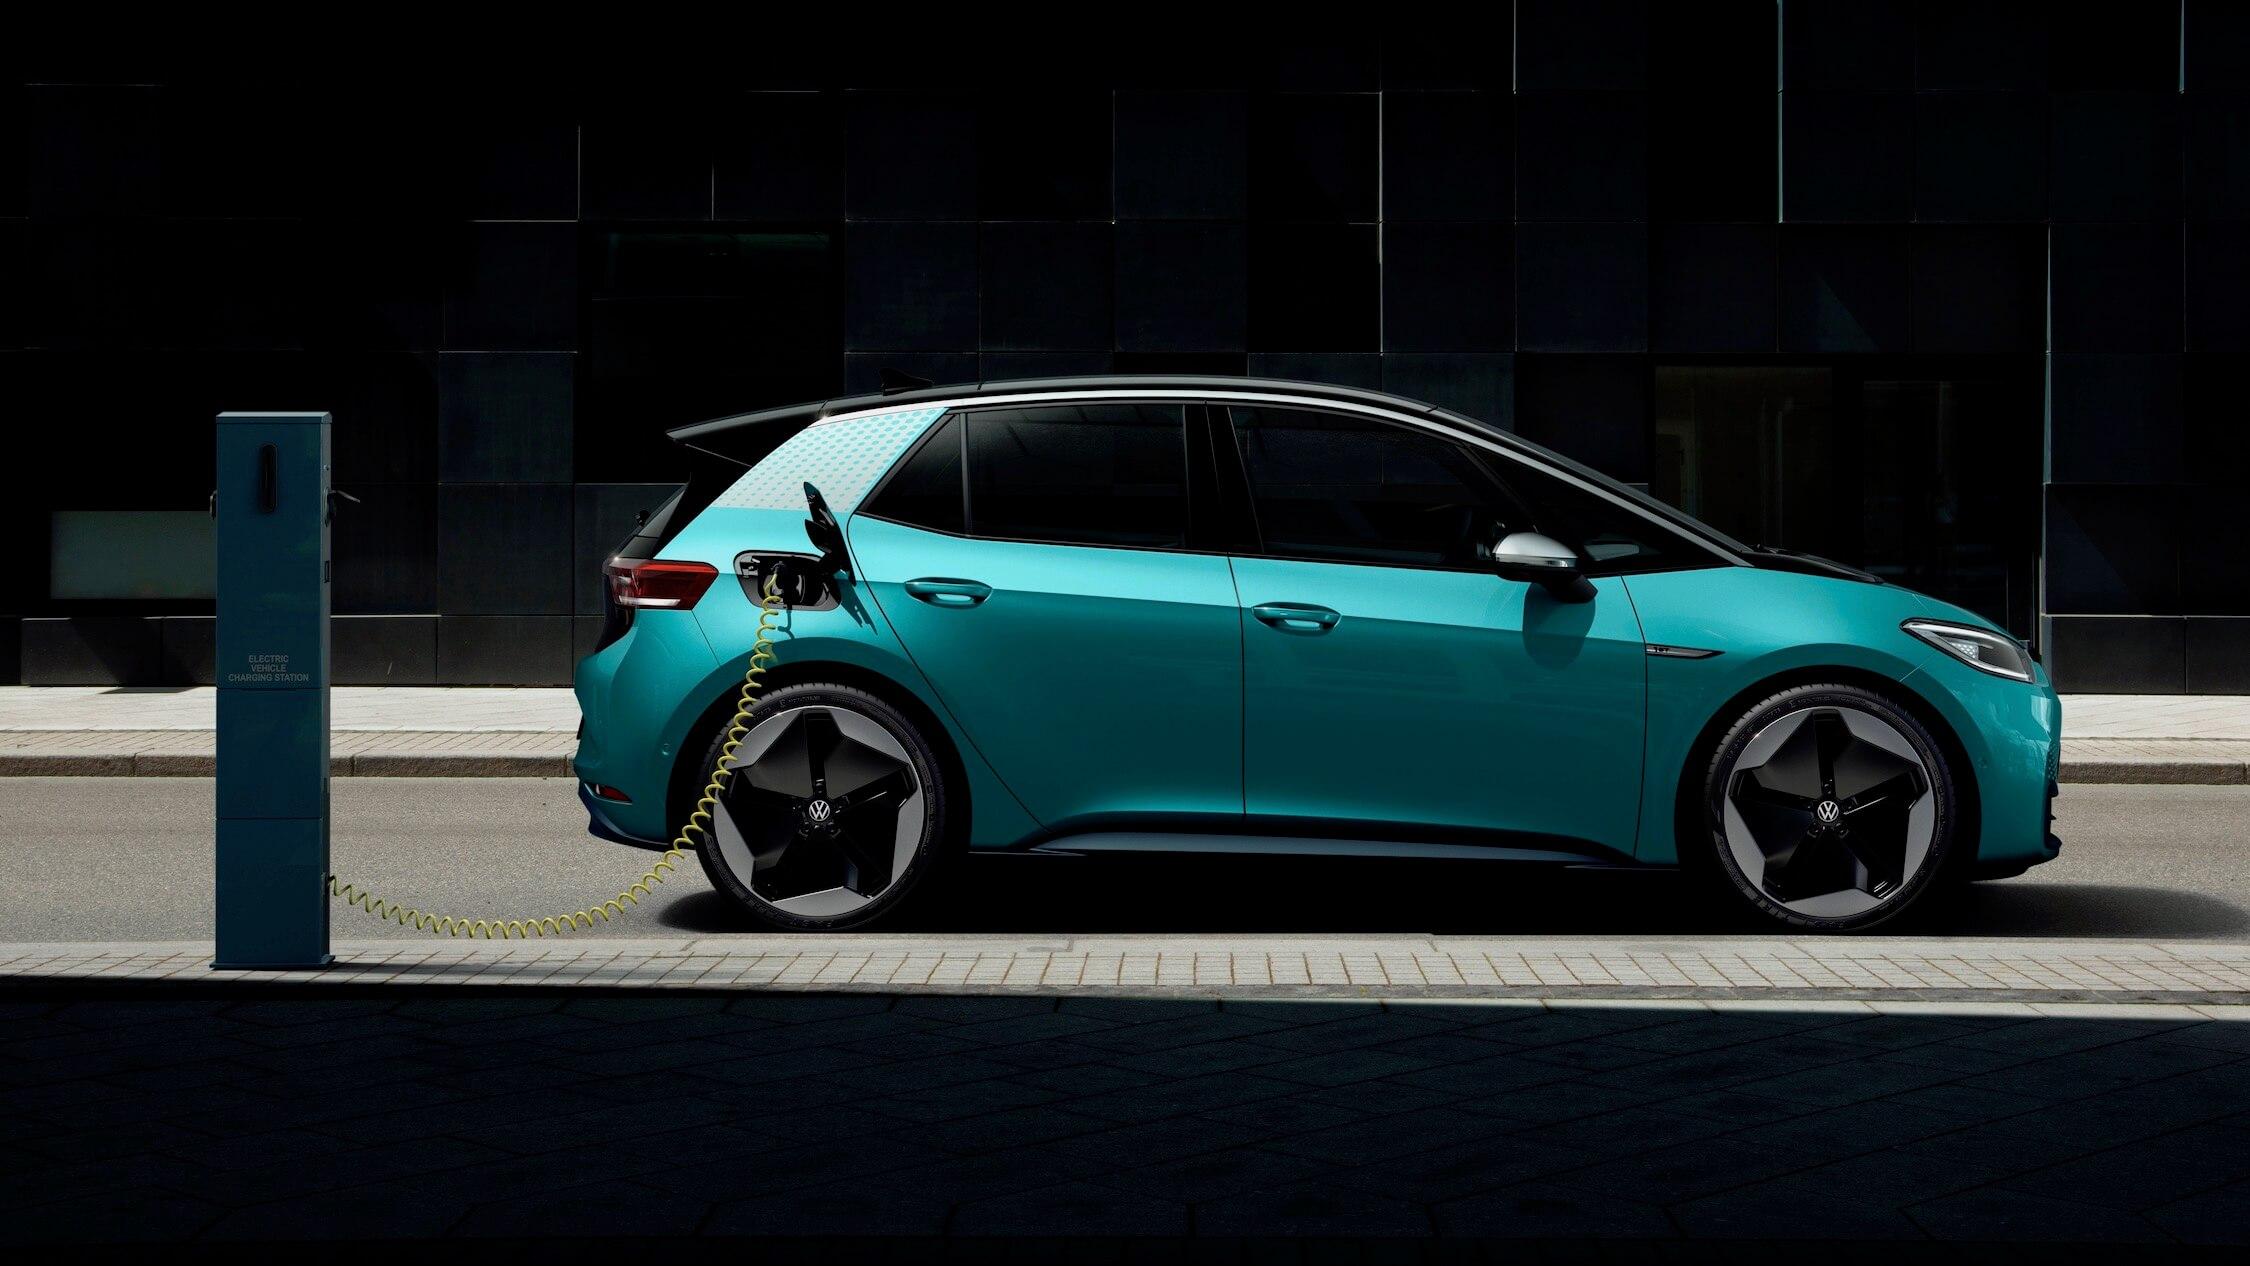 Volkswagen ID 3 carro elétrico